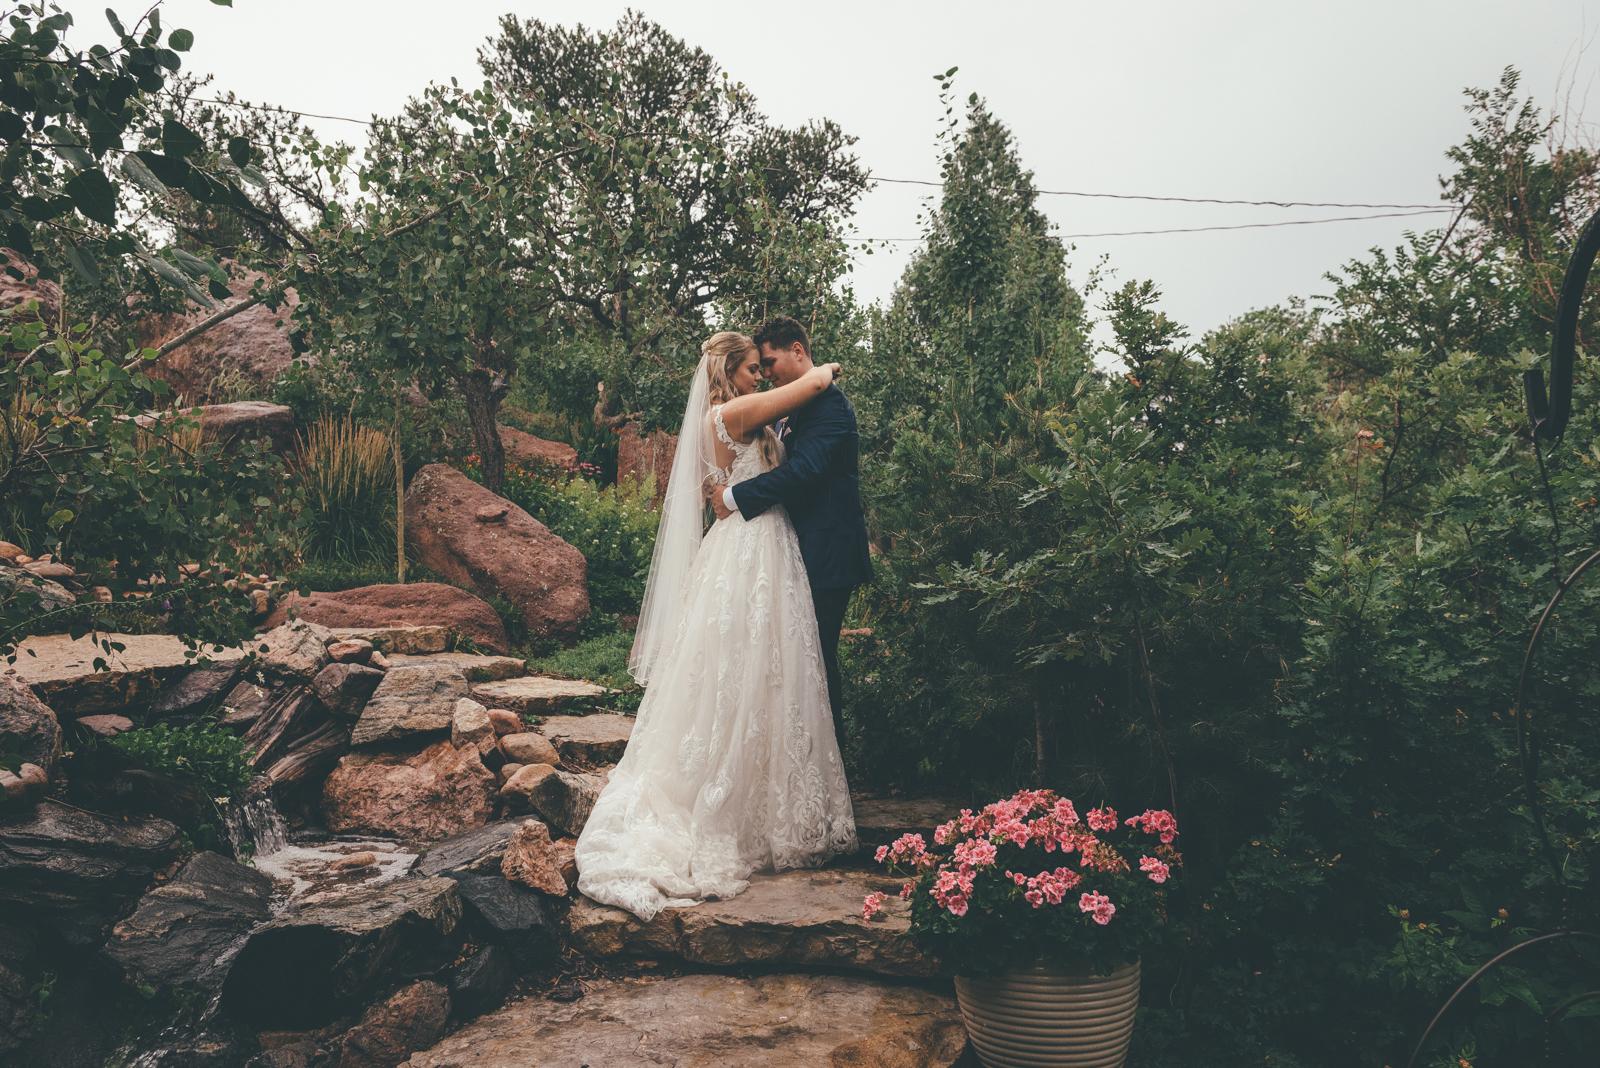 ChadFahnestockPhotography-na-honeymoon-023.jpg